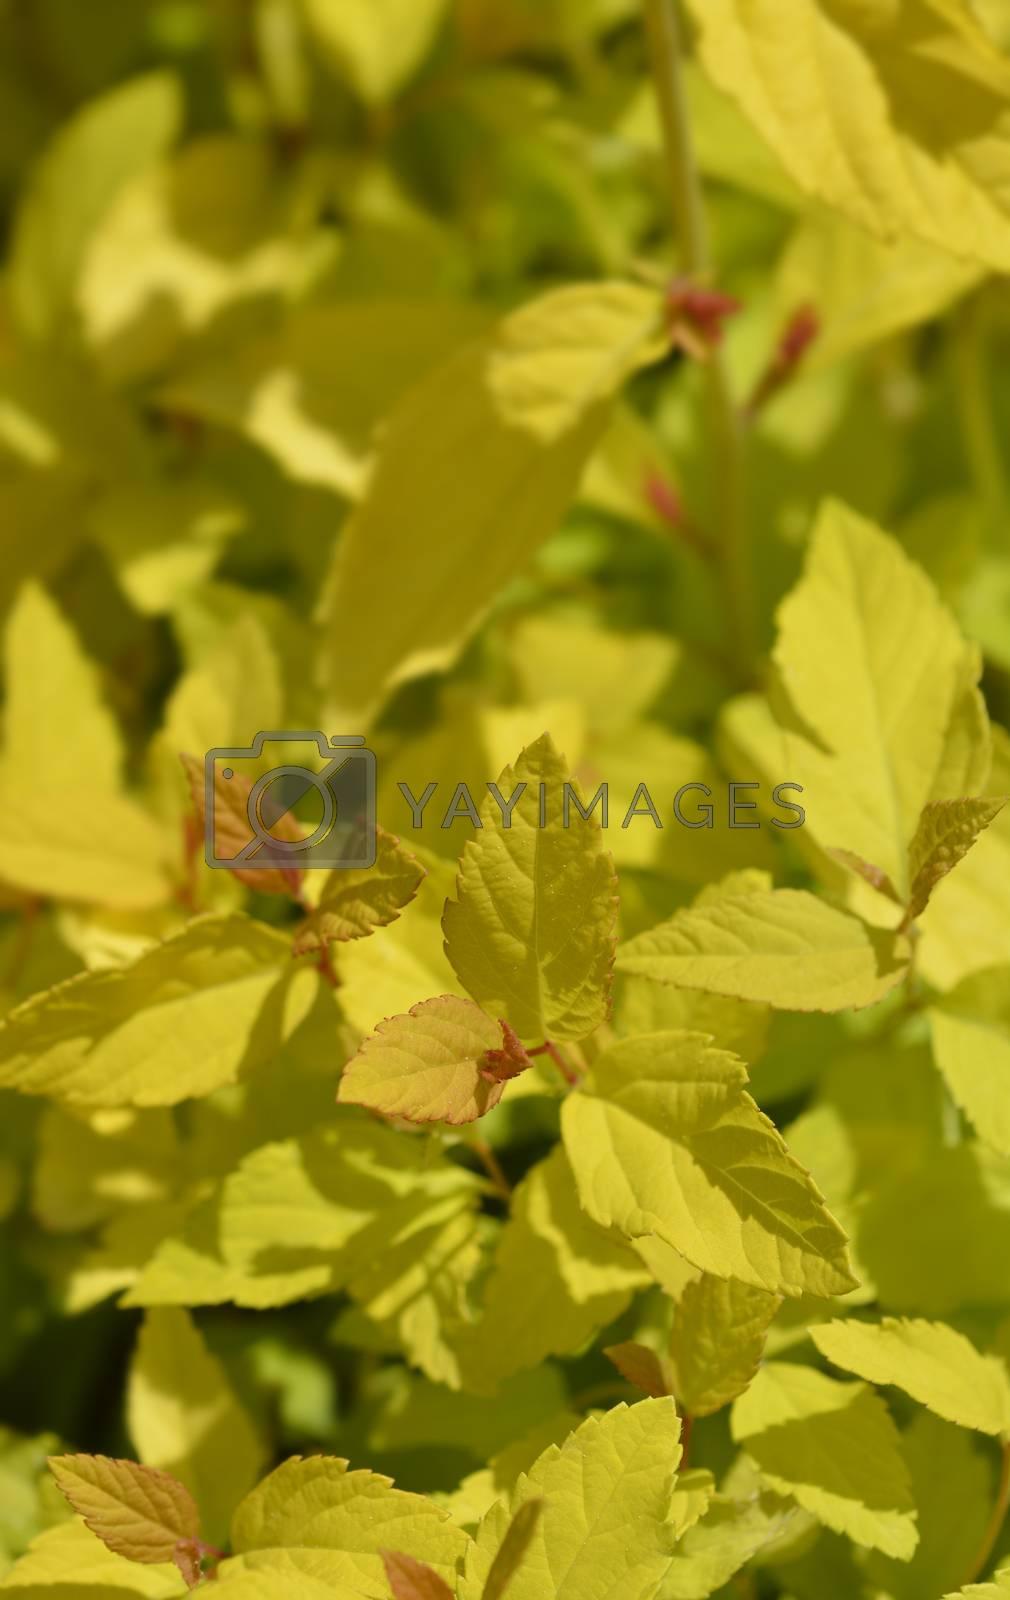 Japanese Spirea Golden Princess leaves - Latin name - Spiraea japonica Golden Princess